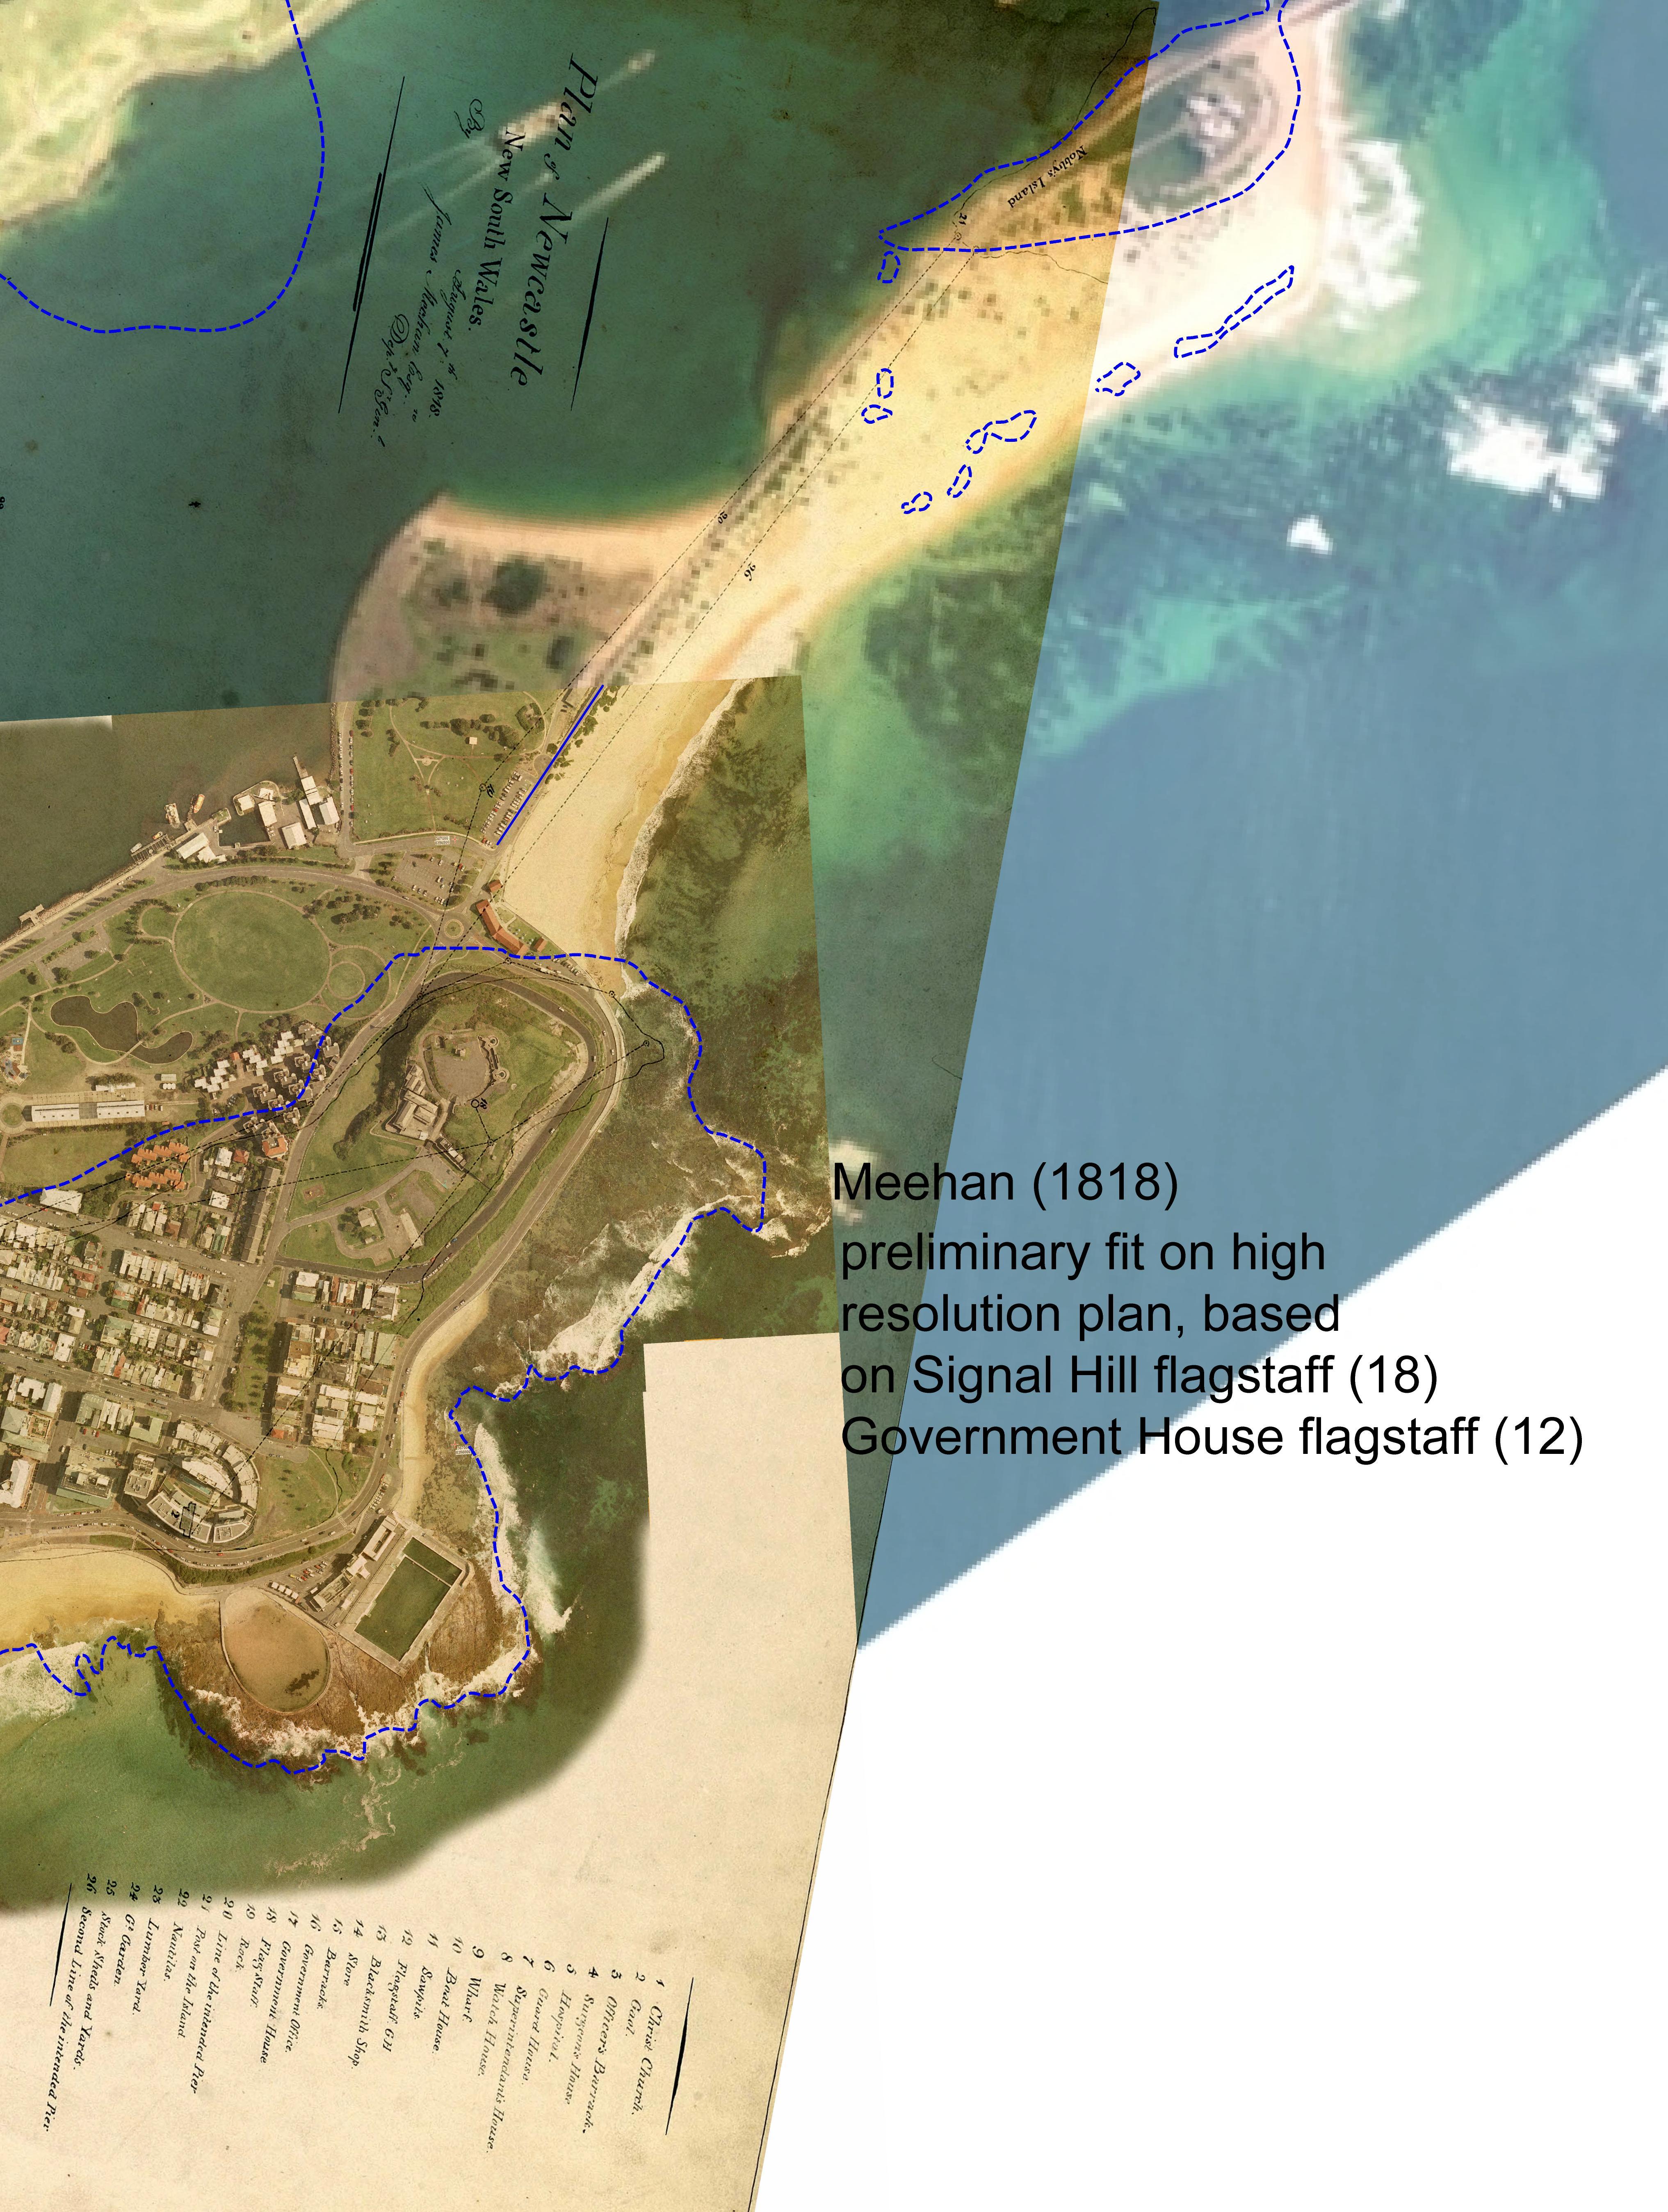 Overlay of James Meehan 1818 plan